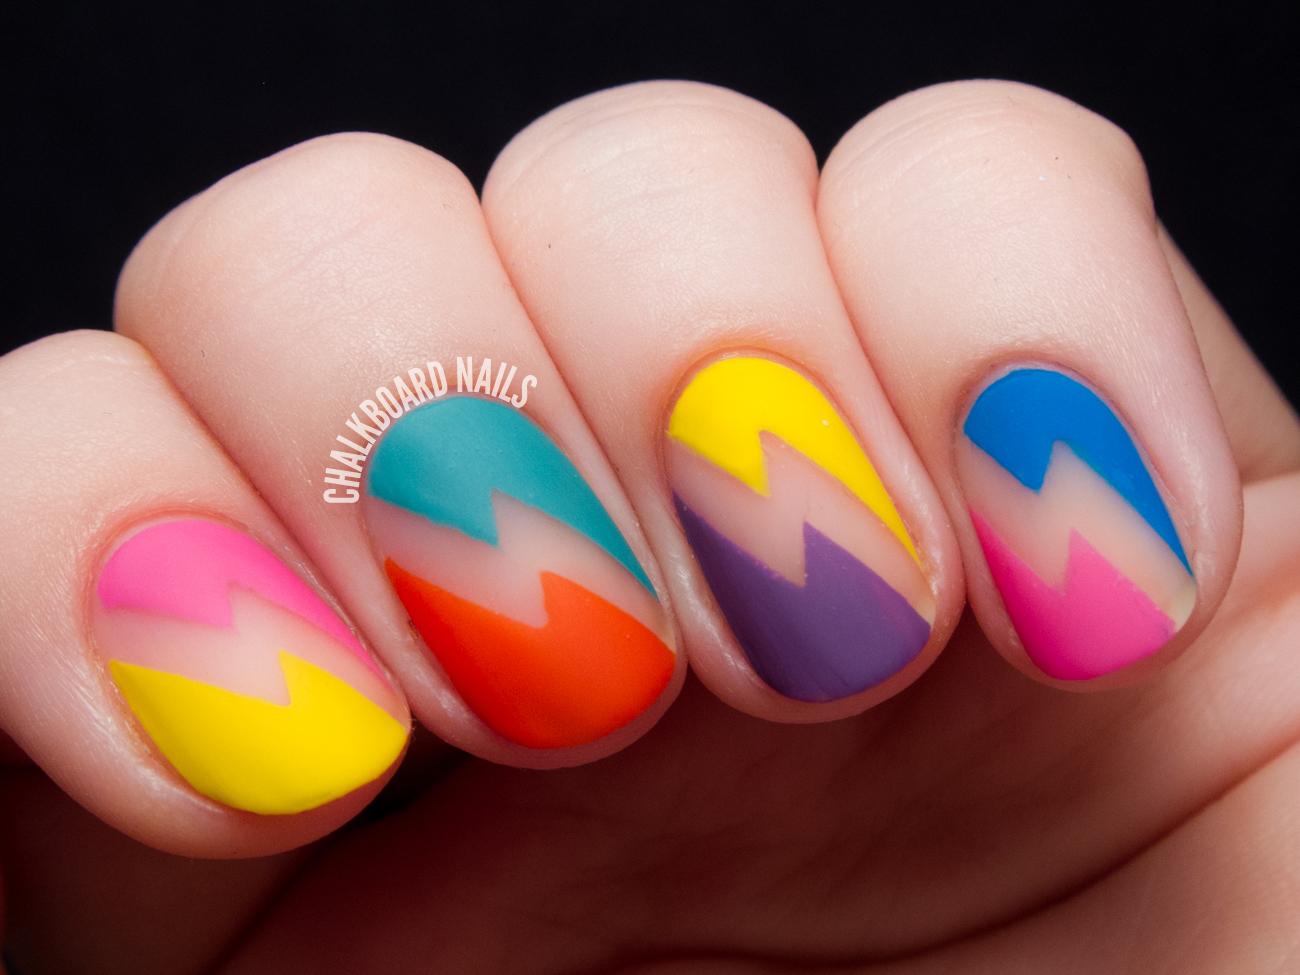 Nail Art: Deborah Lippmann 80s Rewind Nail Art